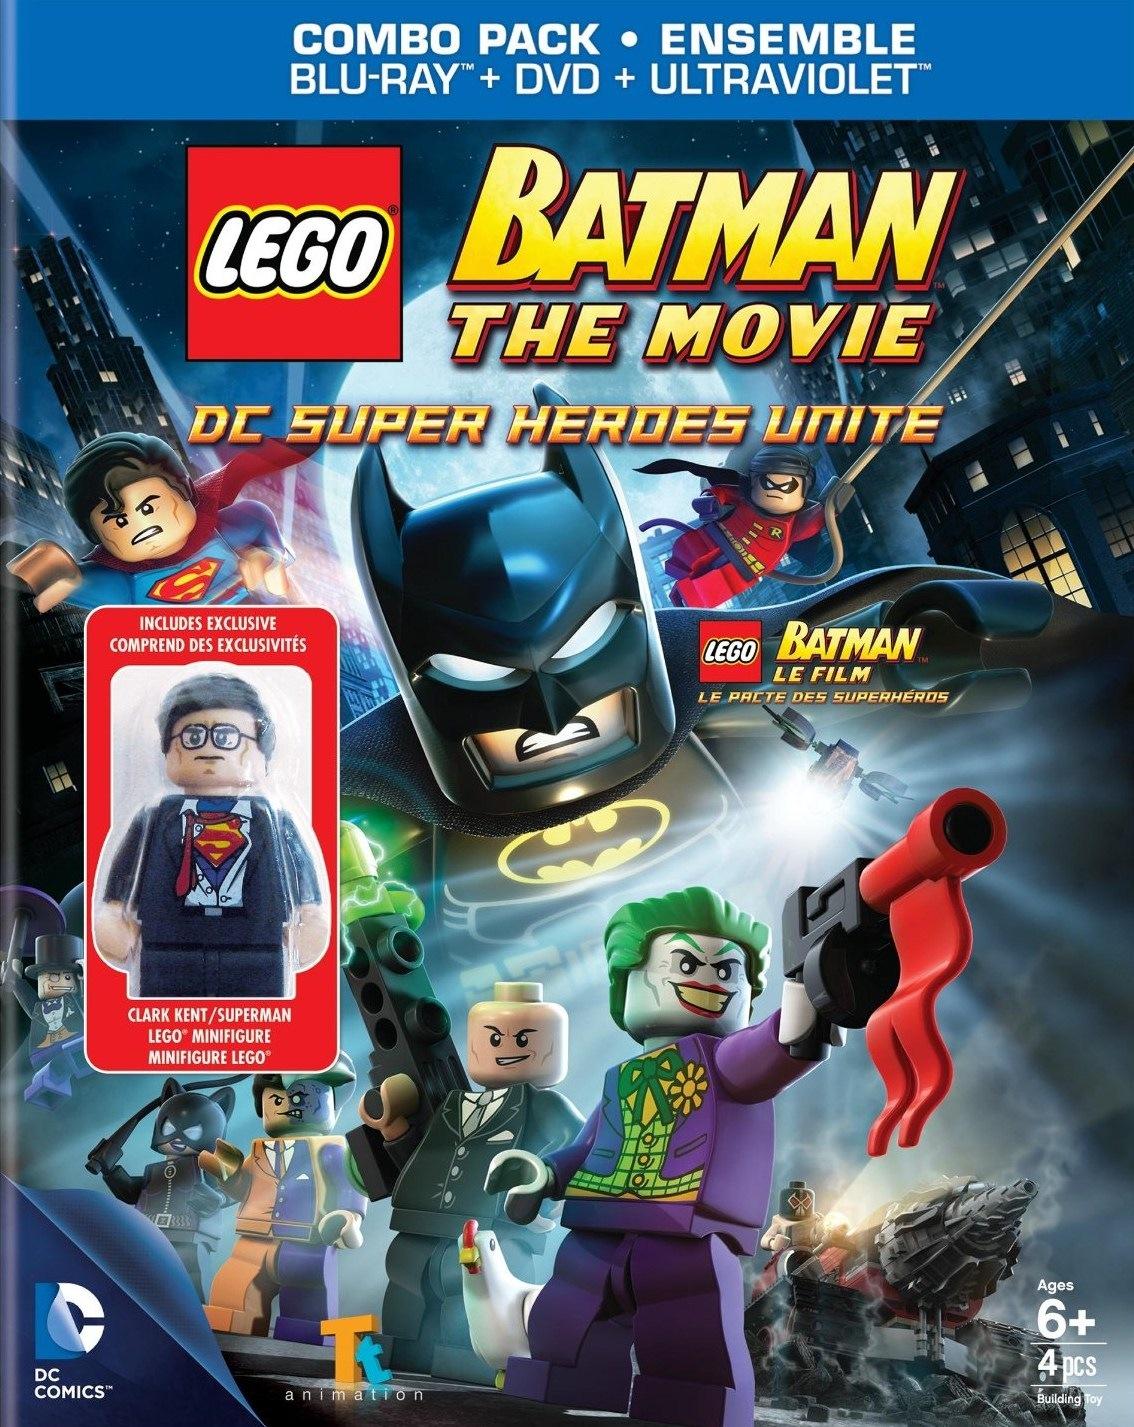 Batman: The Movie HD wallpapers, Desktop wallpaper - most viewed